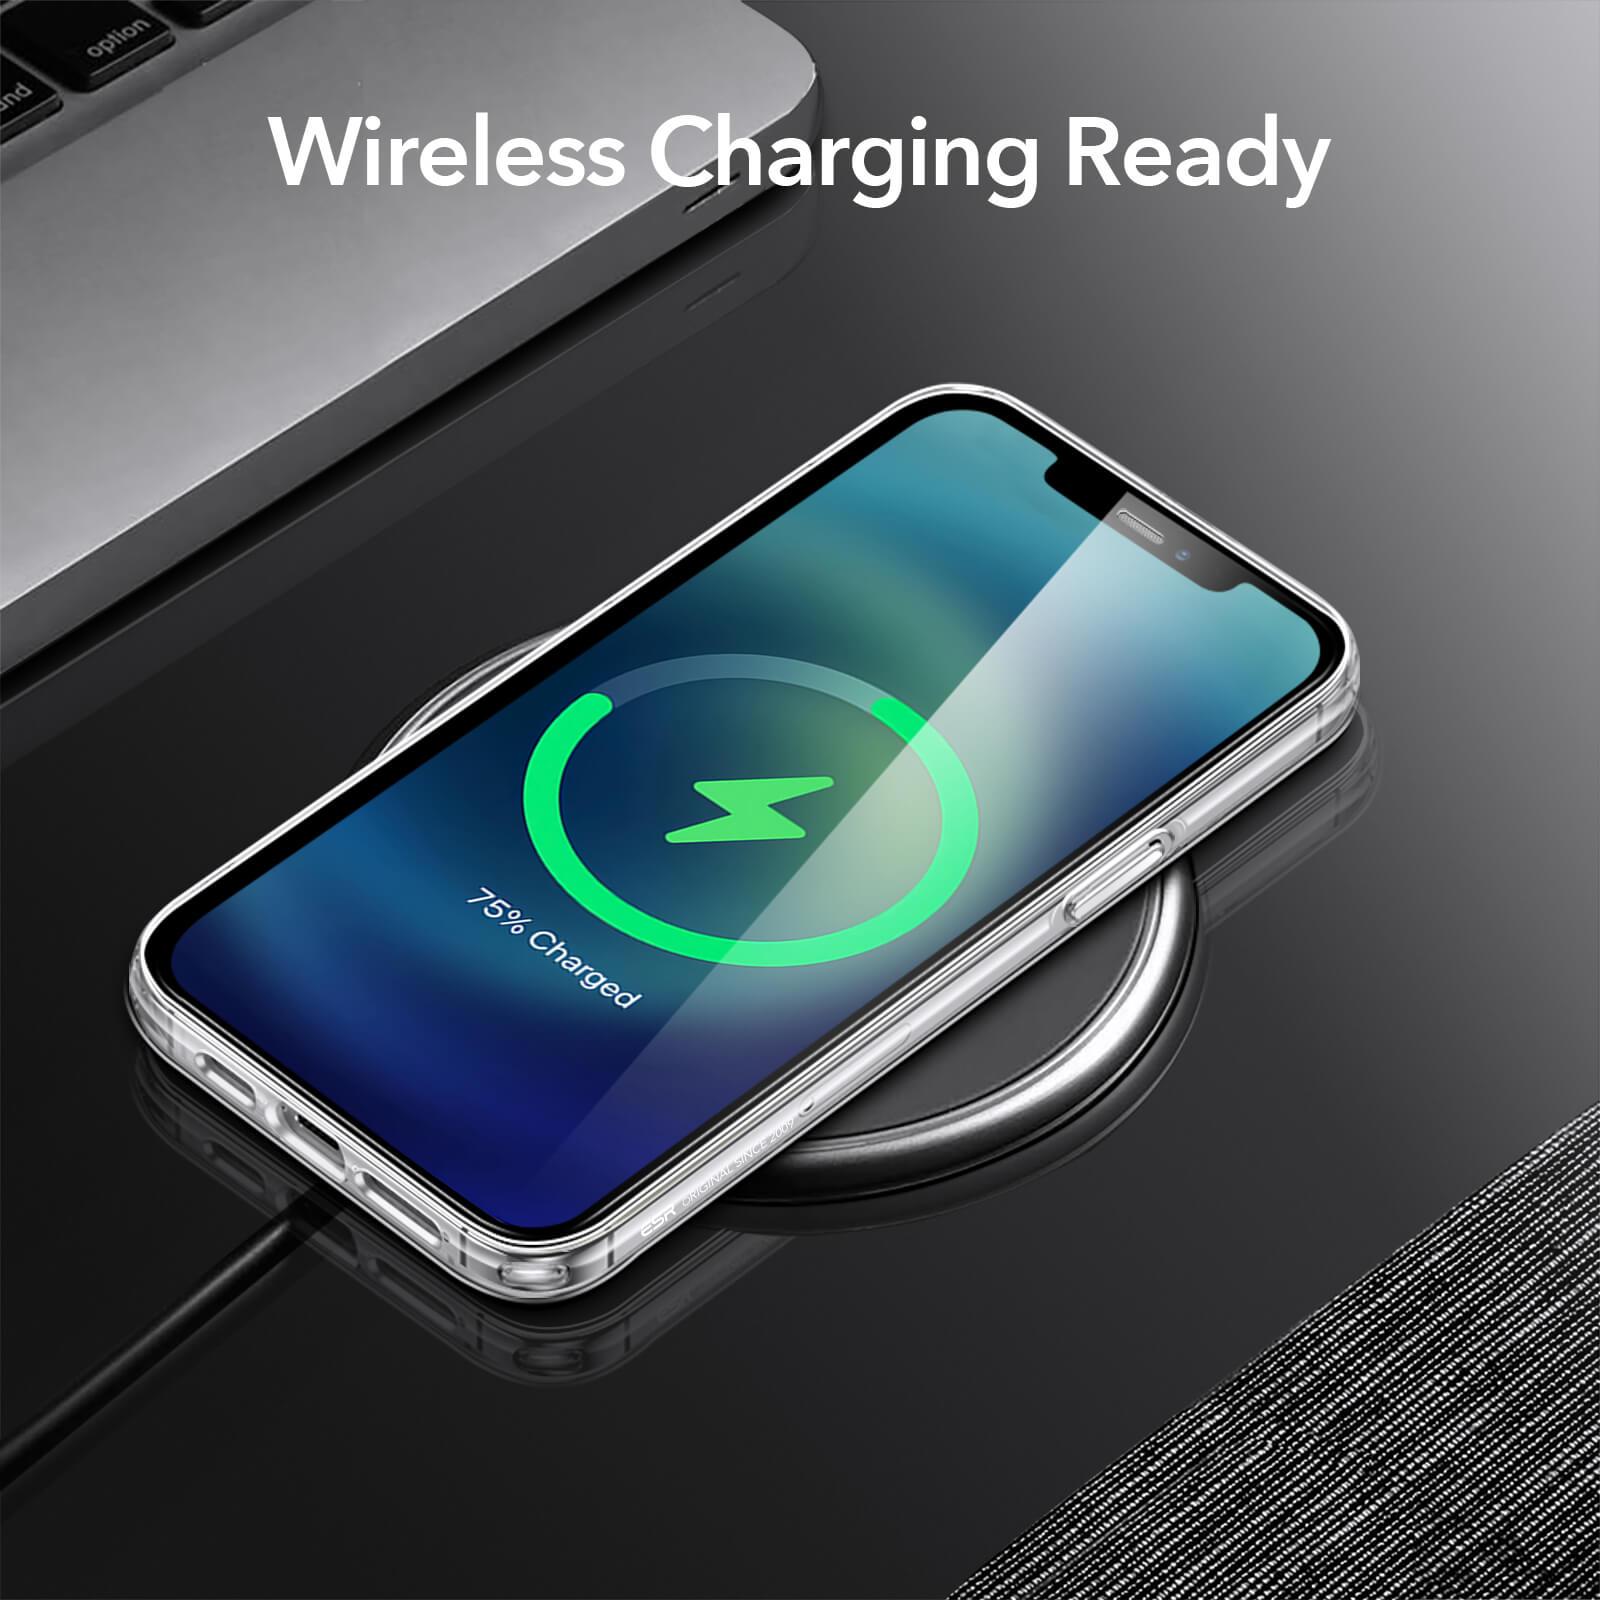 wireless charging ready